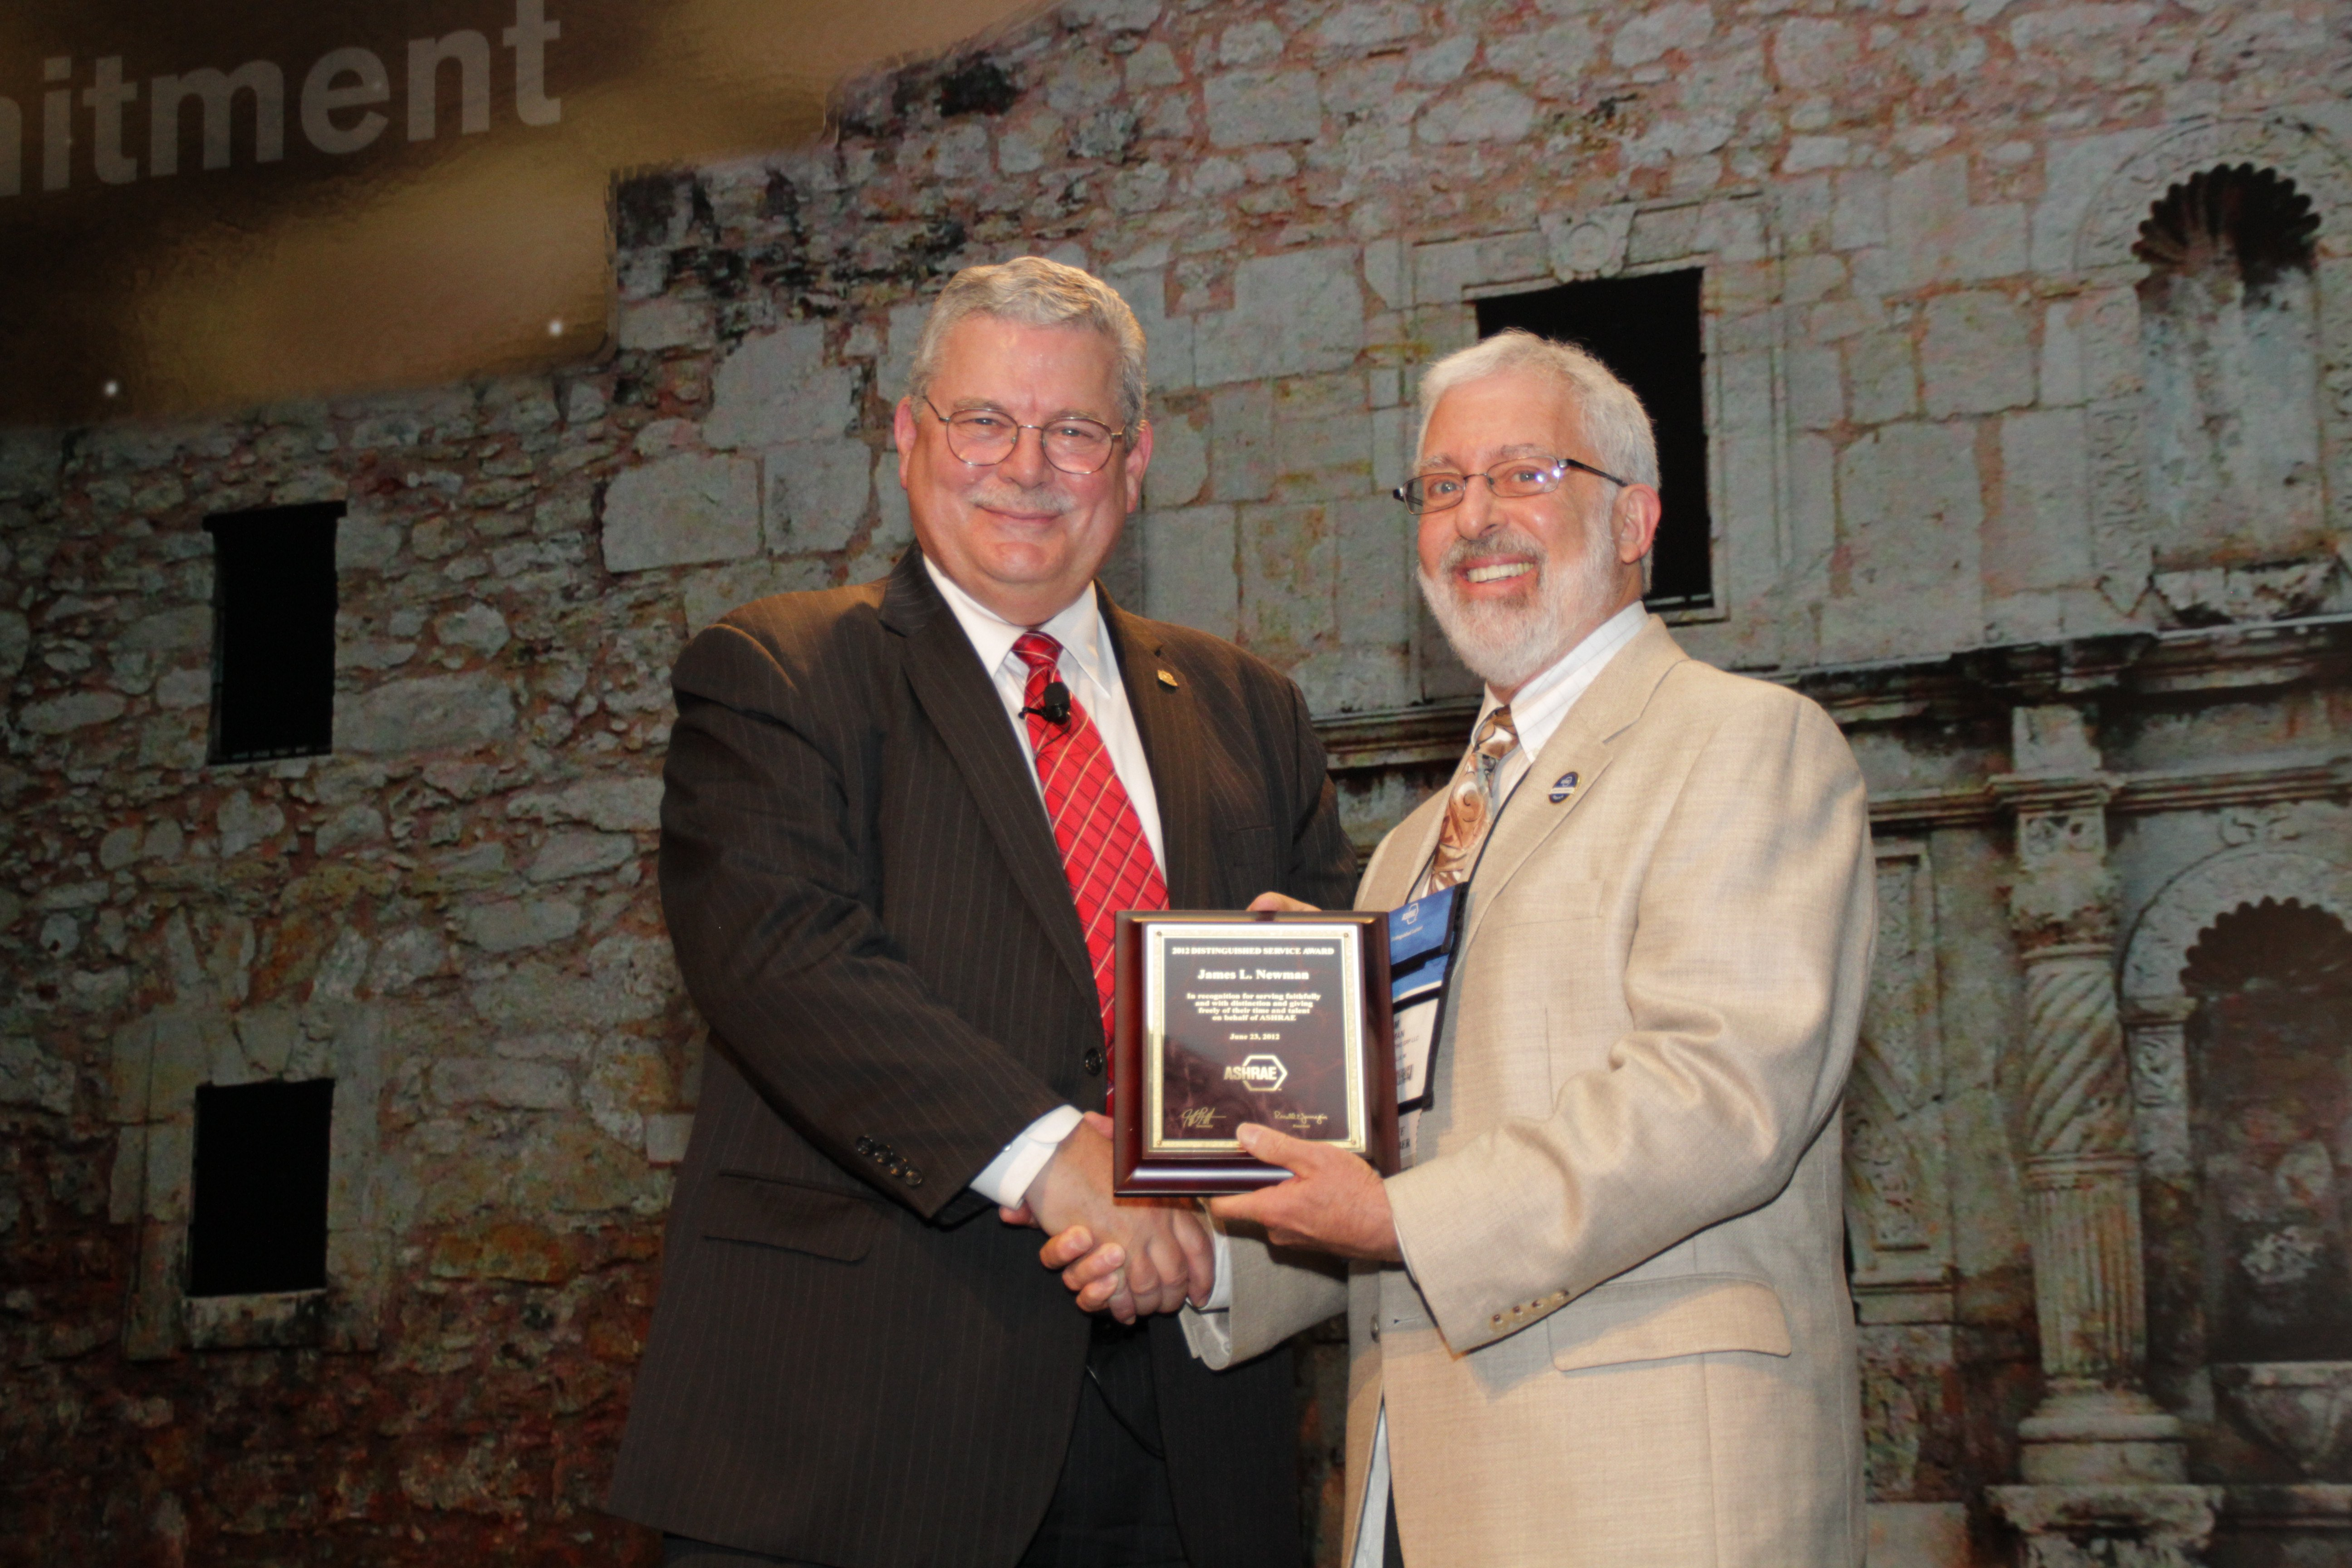 Ron Jarnagin (left), president of ASHRAE, congratulates Jim Newman on receiving the Distinguished Service Award at the ASHRAE Annual Conference.